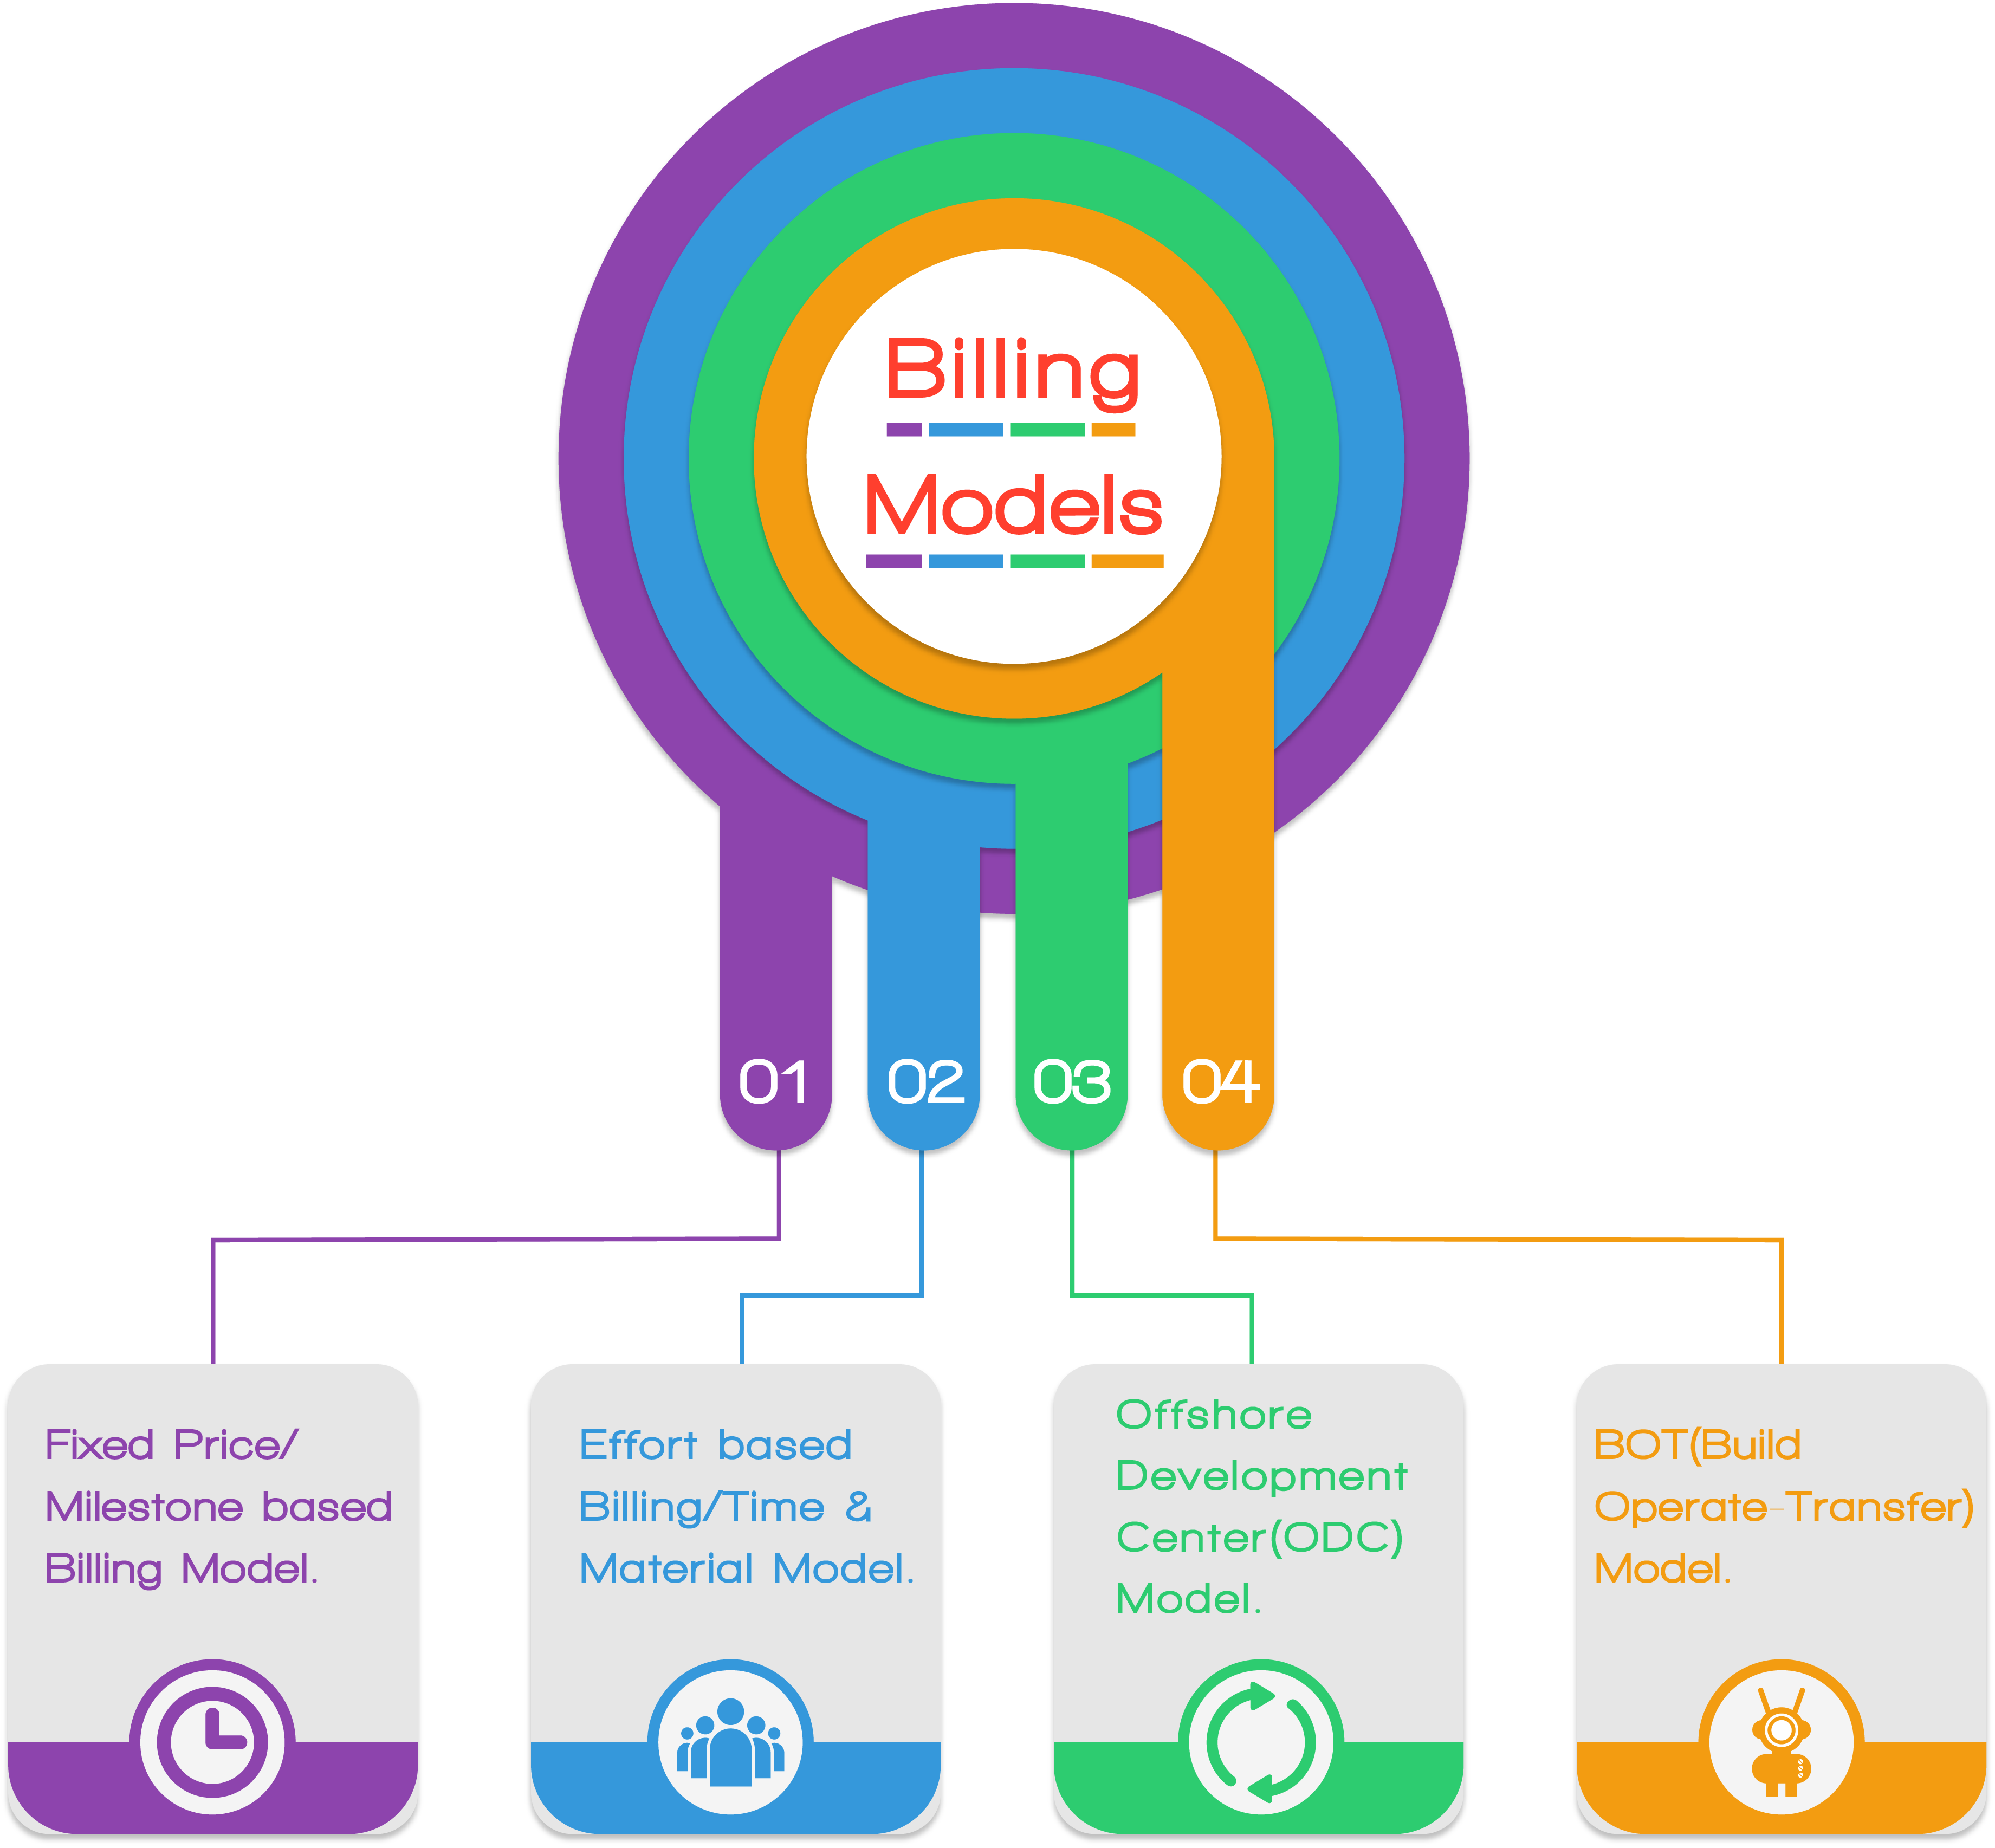 Billing Model